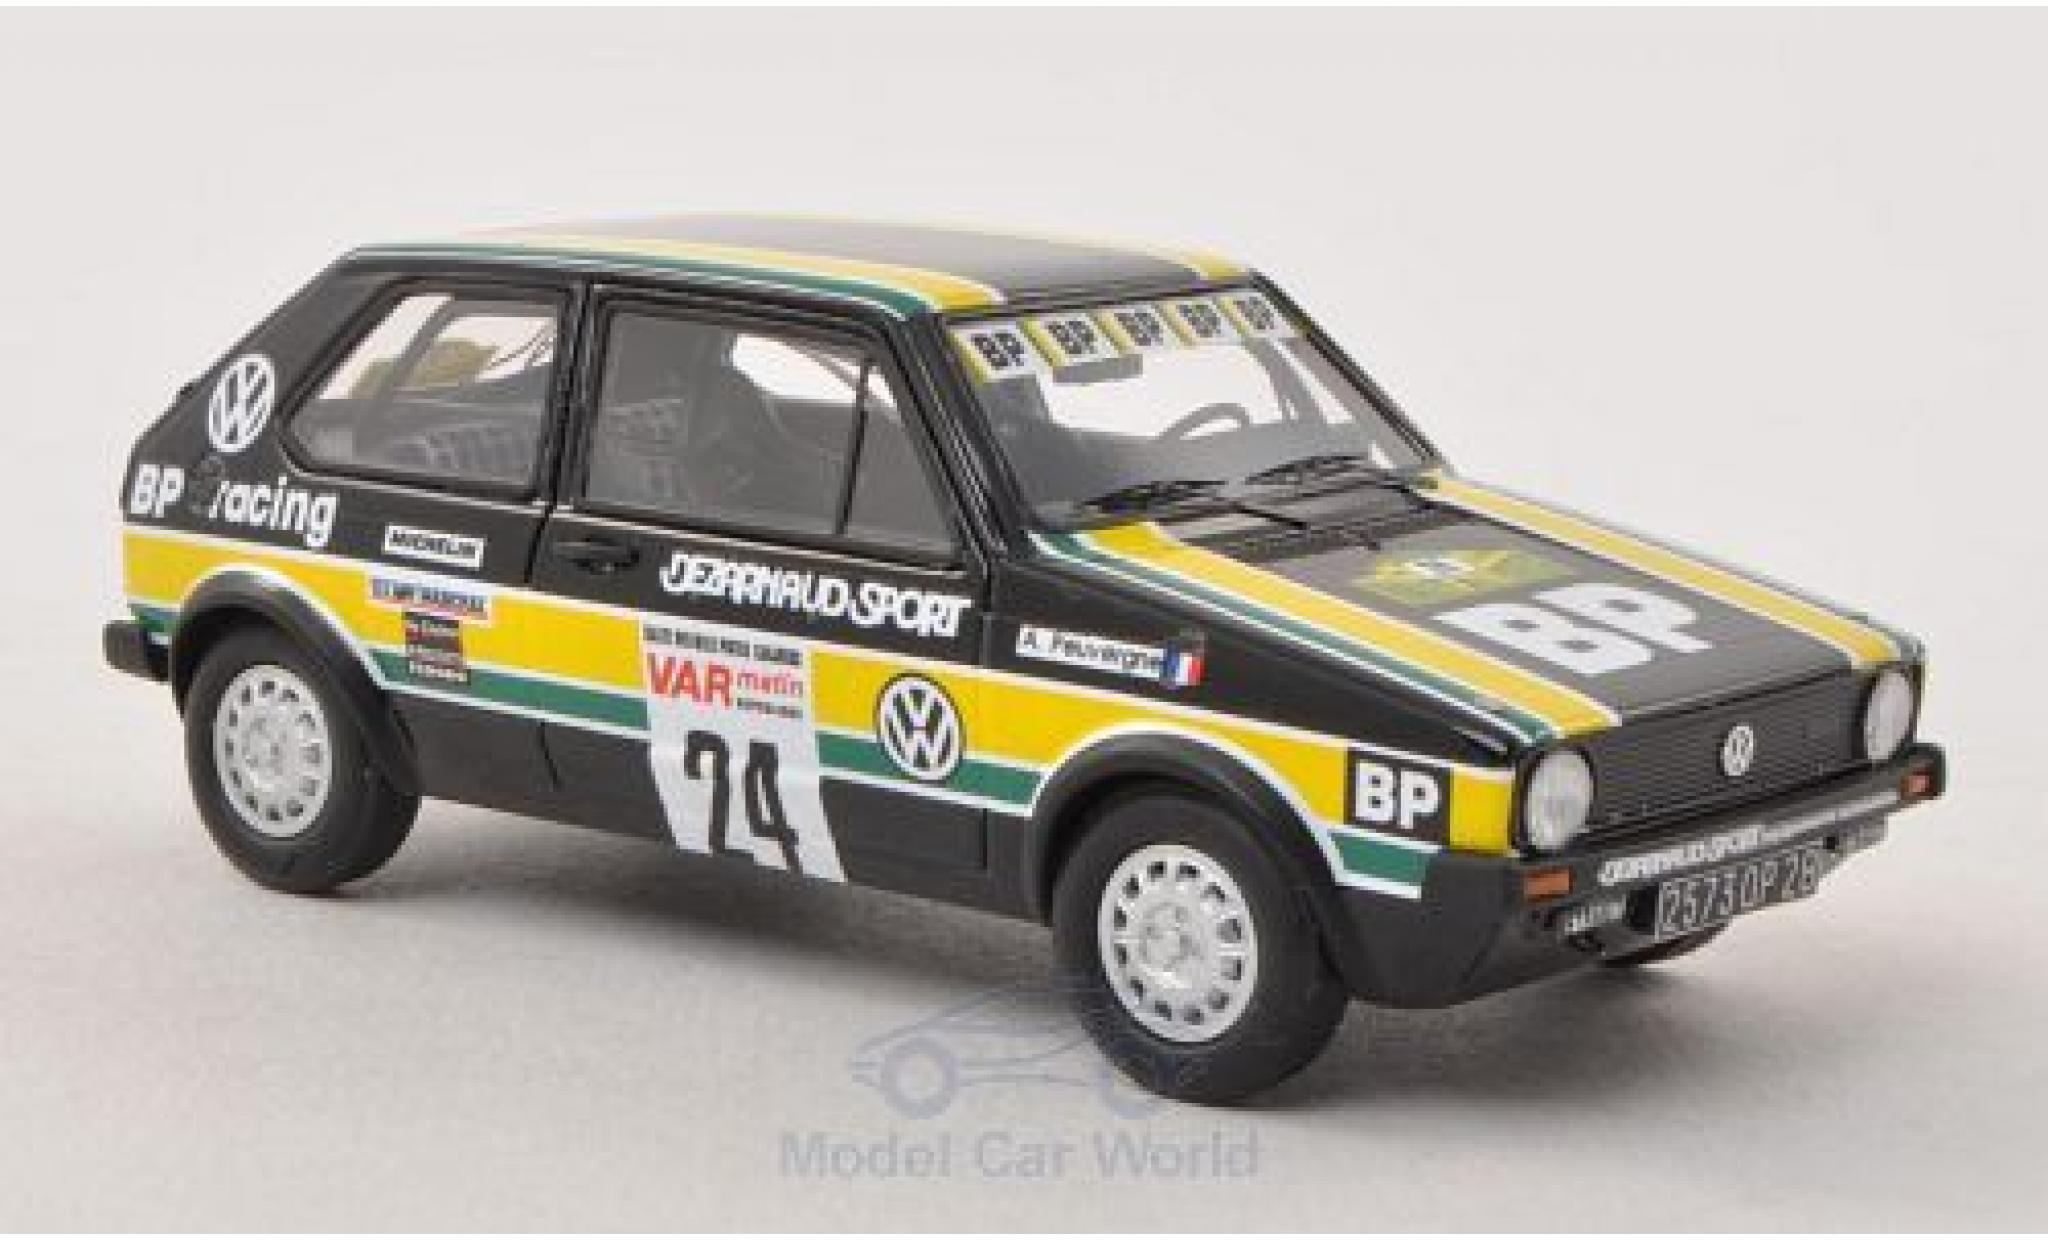 Volkswagen Golf V 1/43 Neo I Gr.1 No.24 BP Racing - Dezarnaud Sport Rallye des 1000 Pistes 1980 /A.Peuvergne